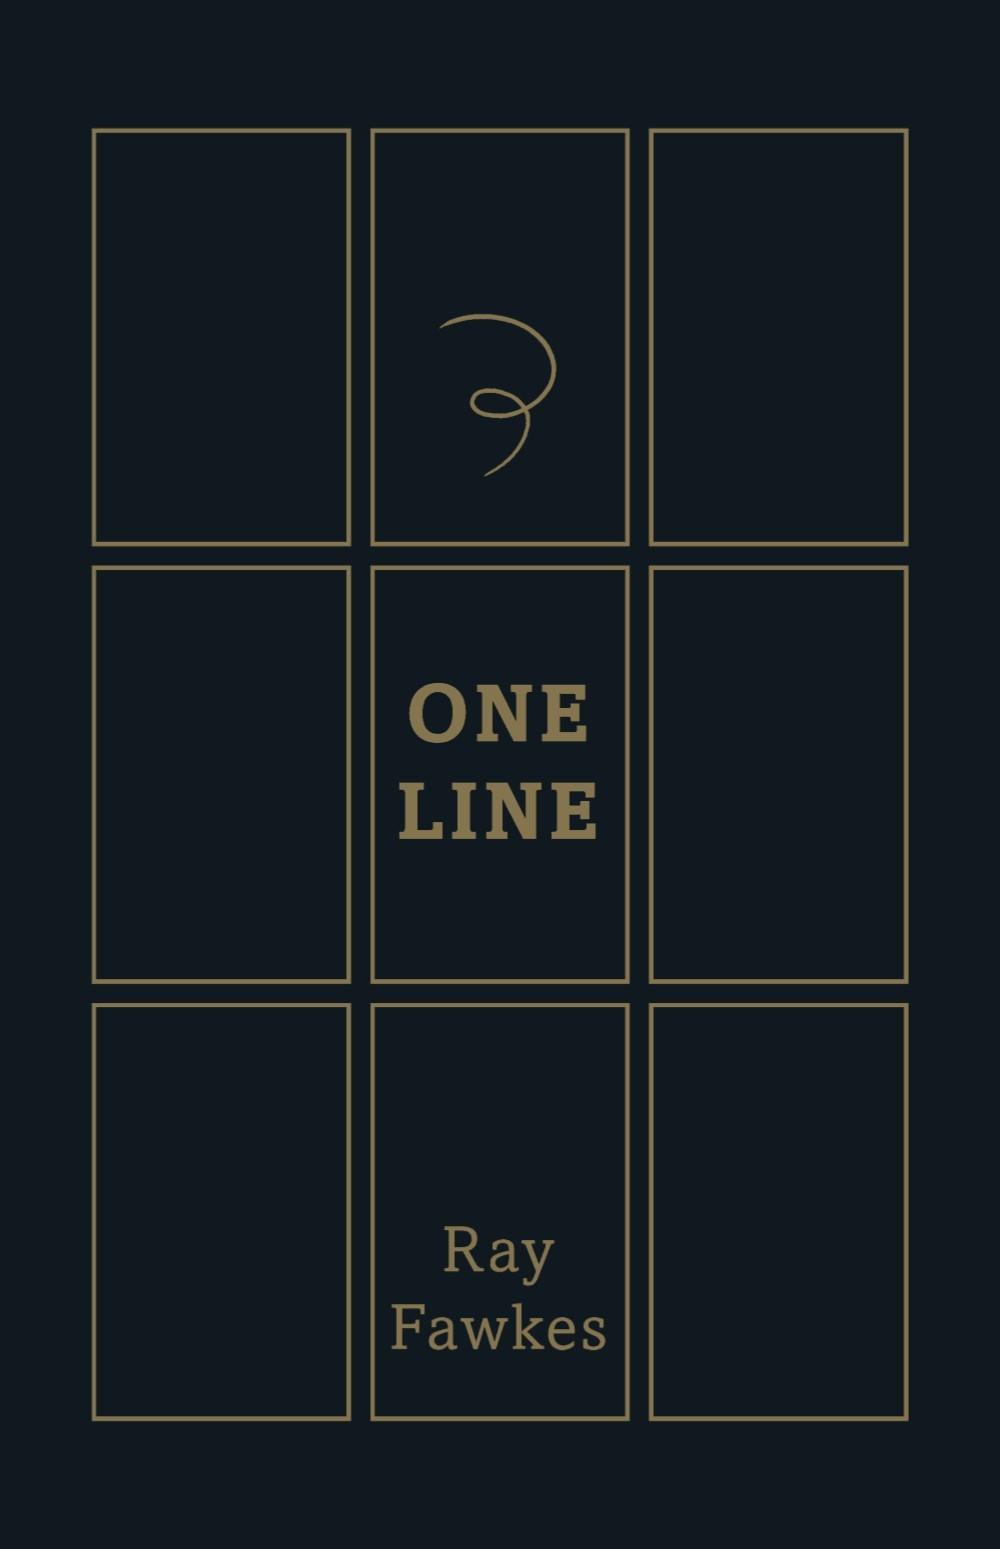 ONELINE-HC-MARKETING-001 ComicList Previews: ONE LINE HC